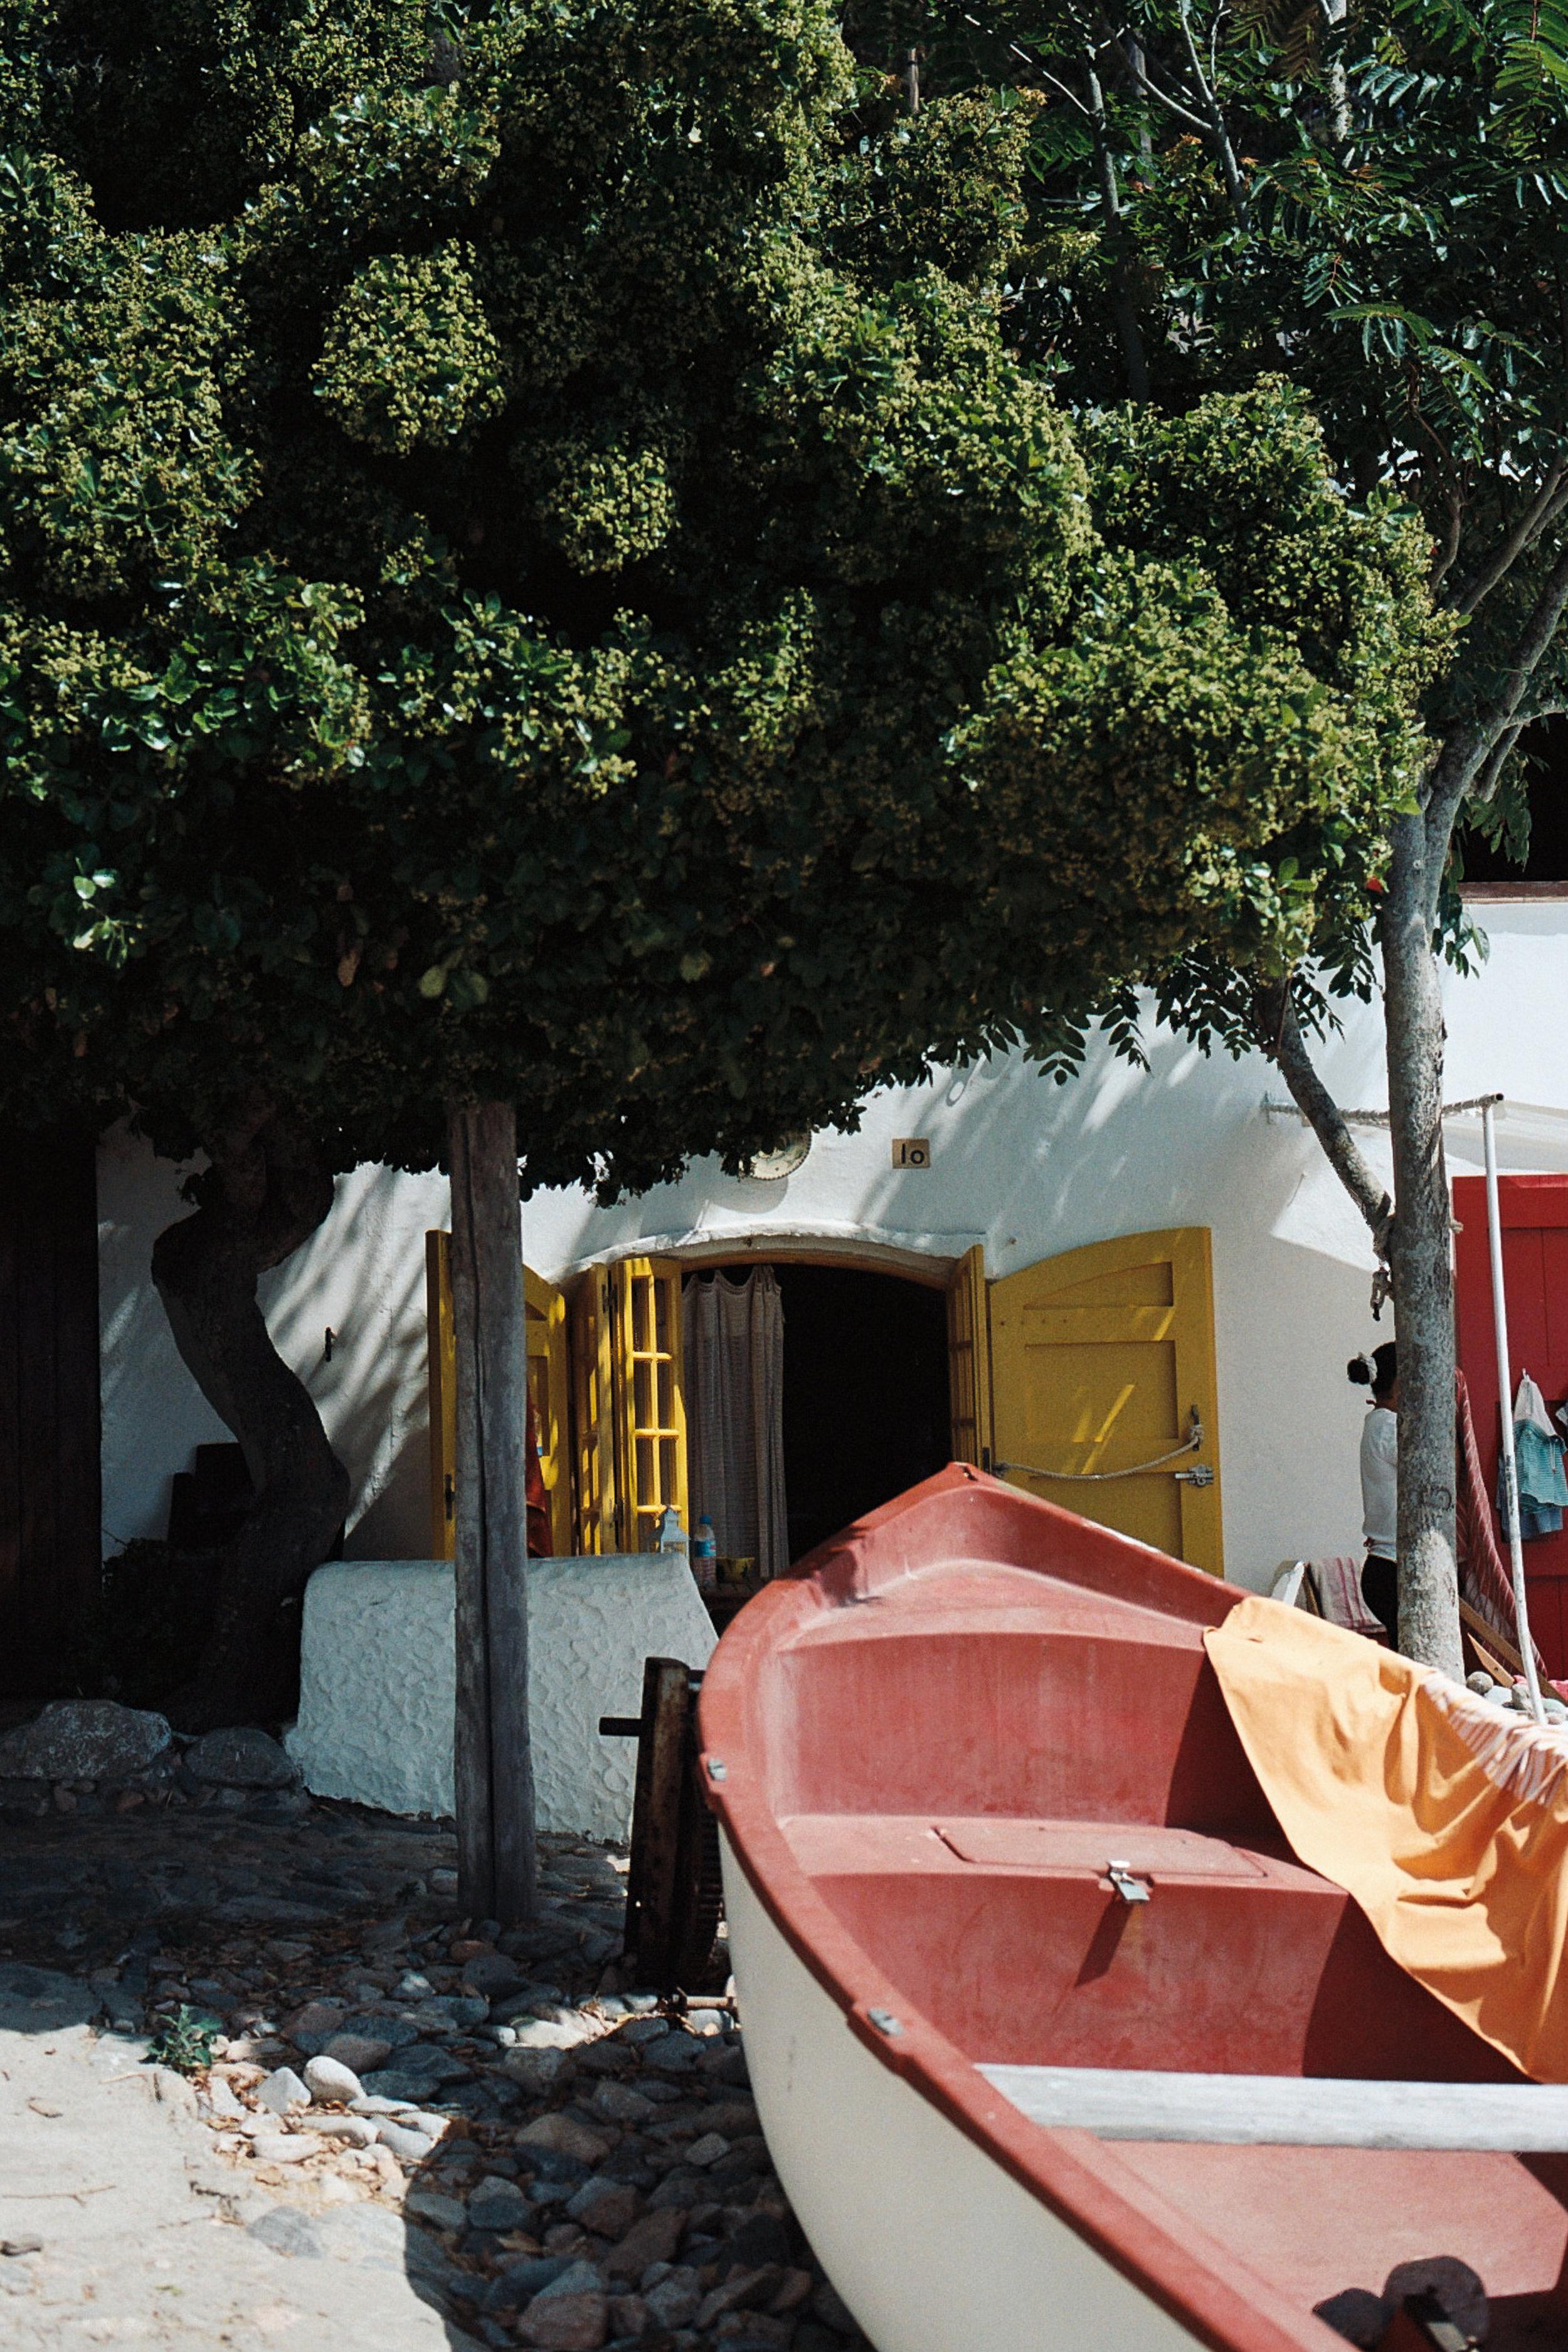 Costa Brava. 35mm